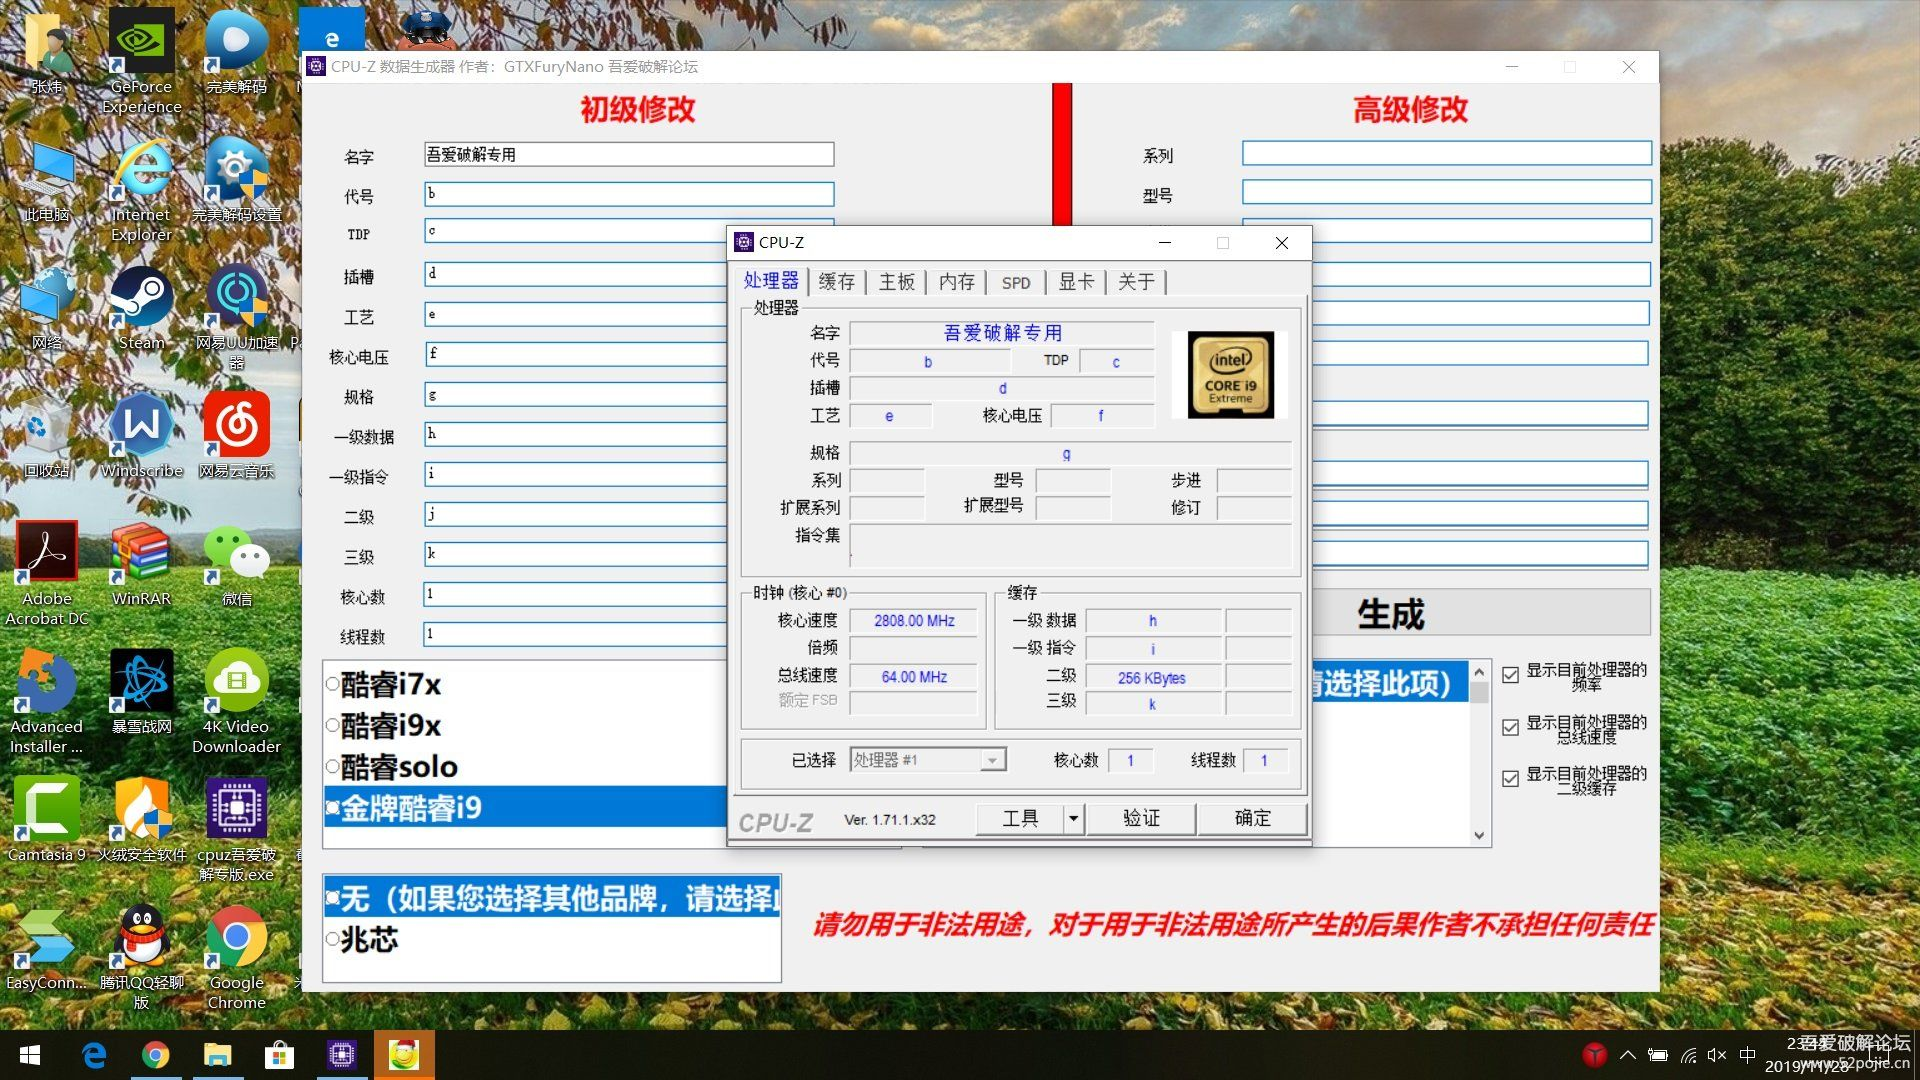 CPU-Z数据生成器 装逼工具 一键生成截图